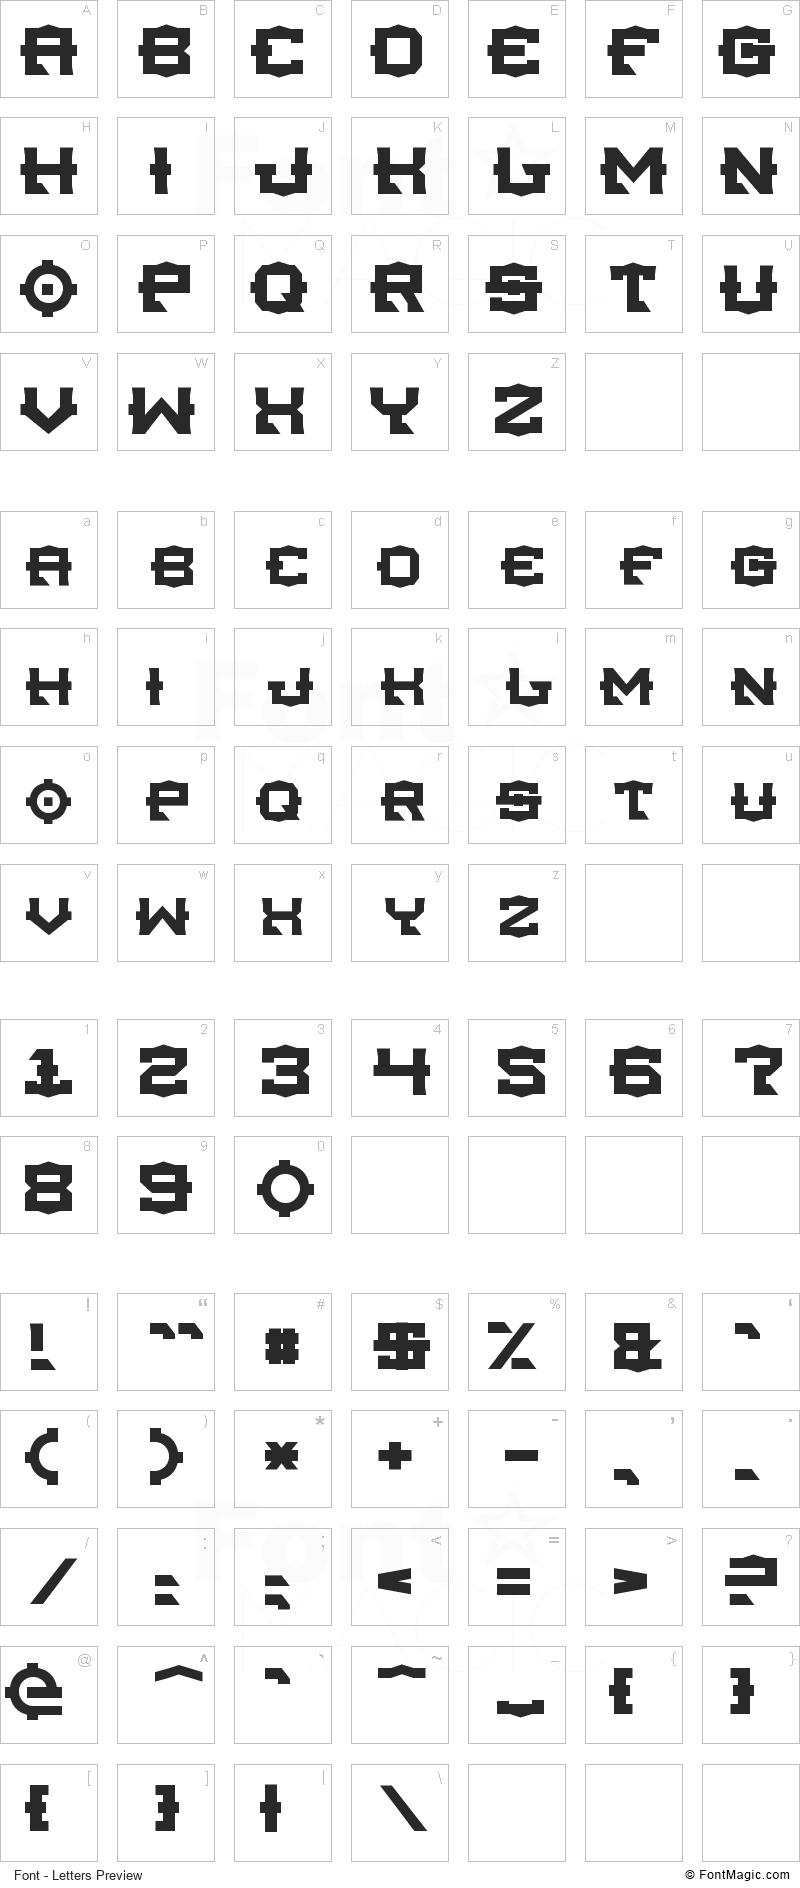 TSA Font - All Latters Preview Chart